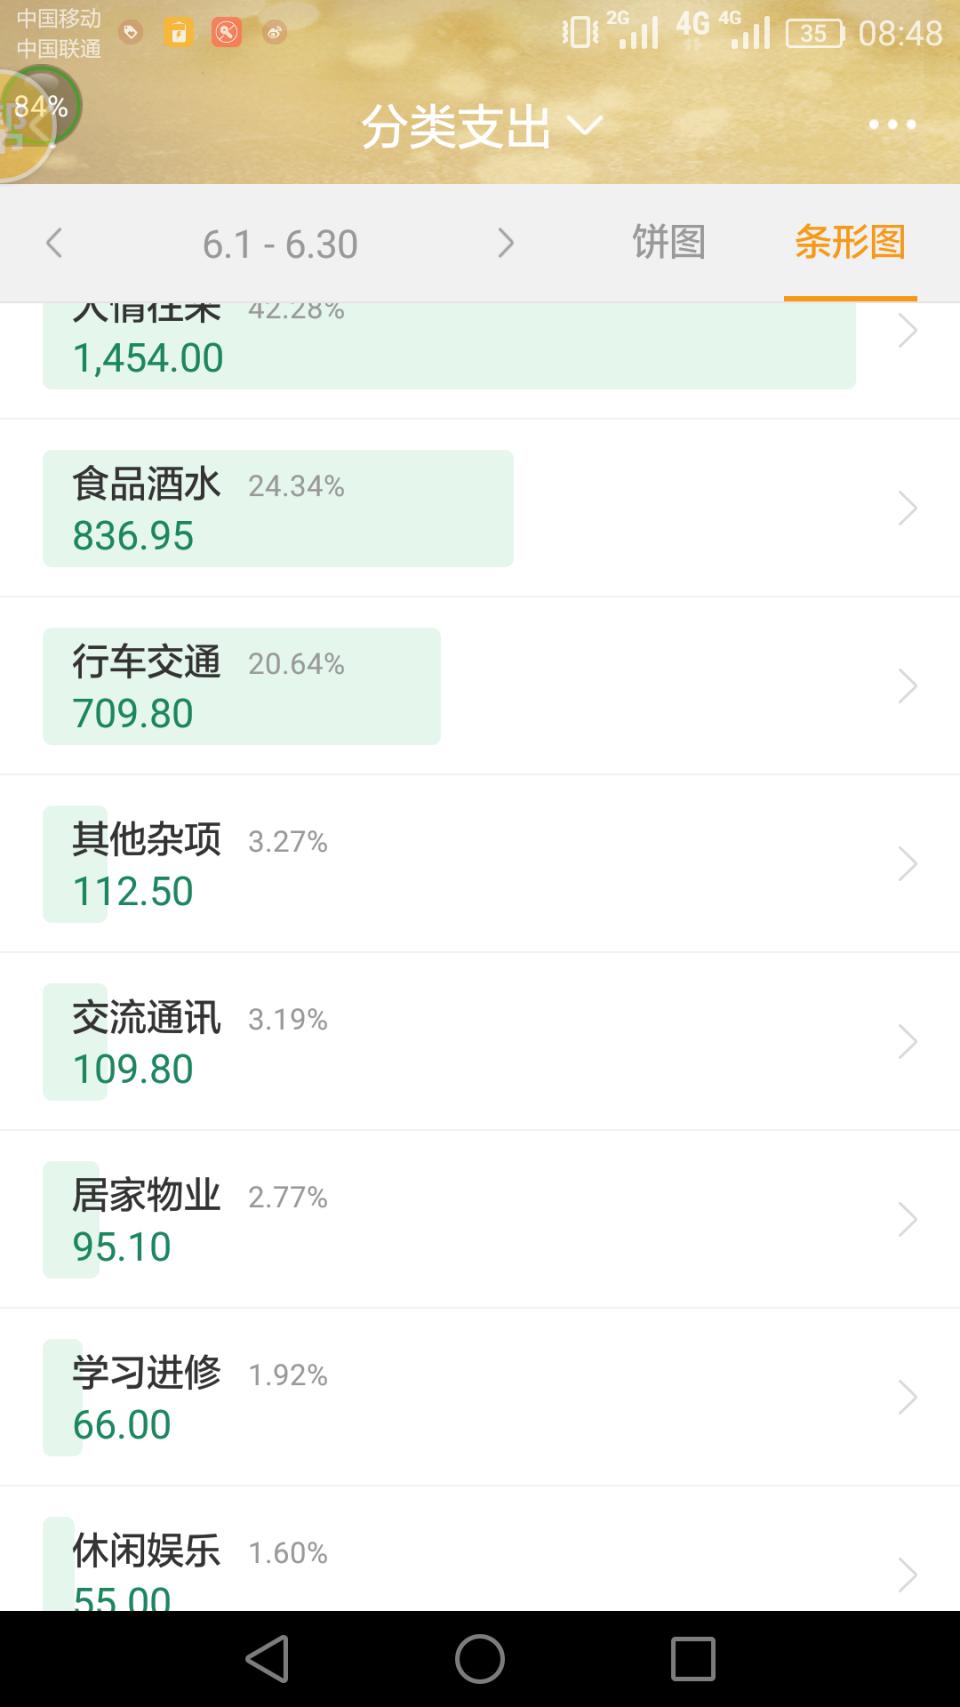 Screenshot_2018-07-02-08-48-15.png